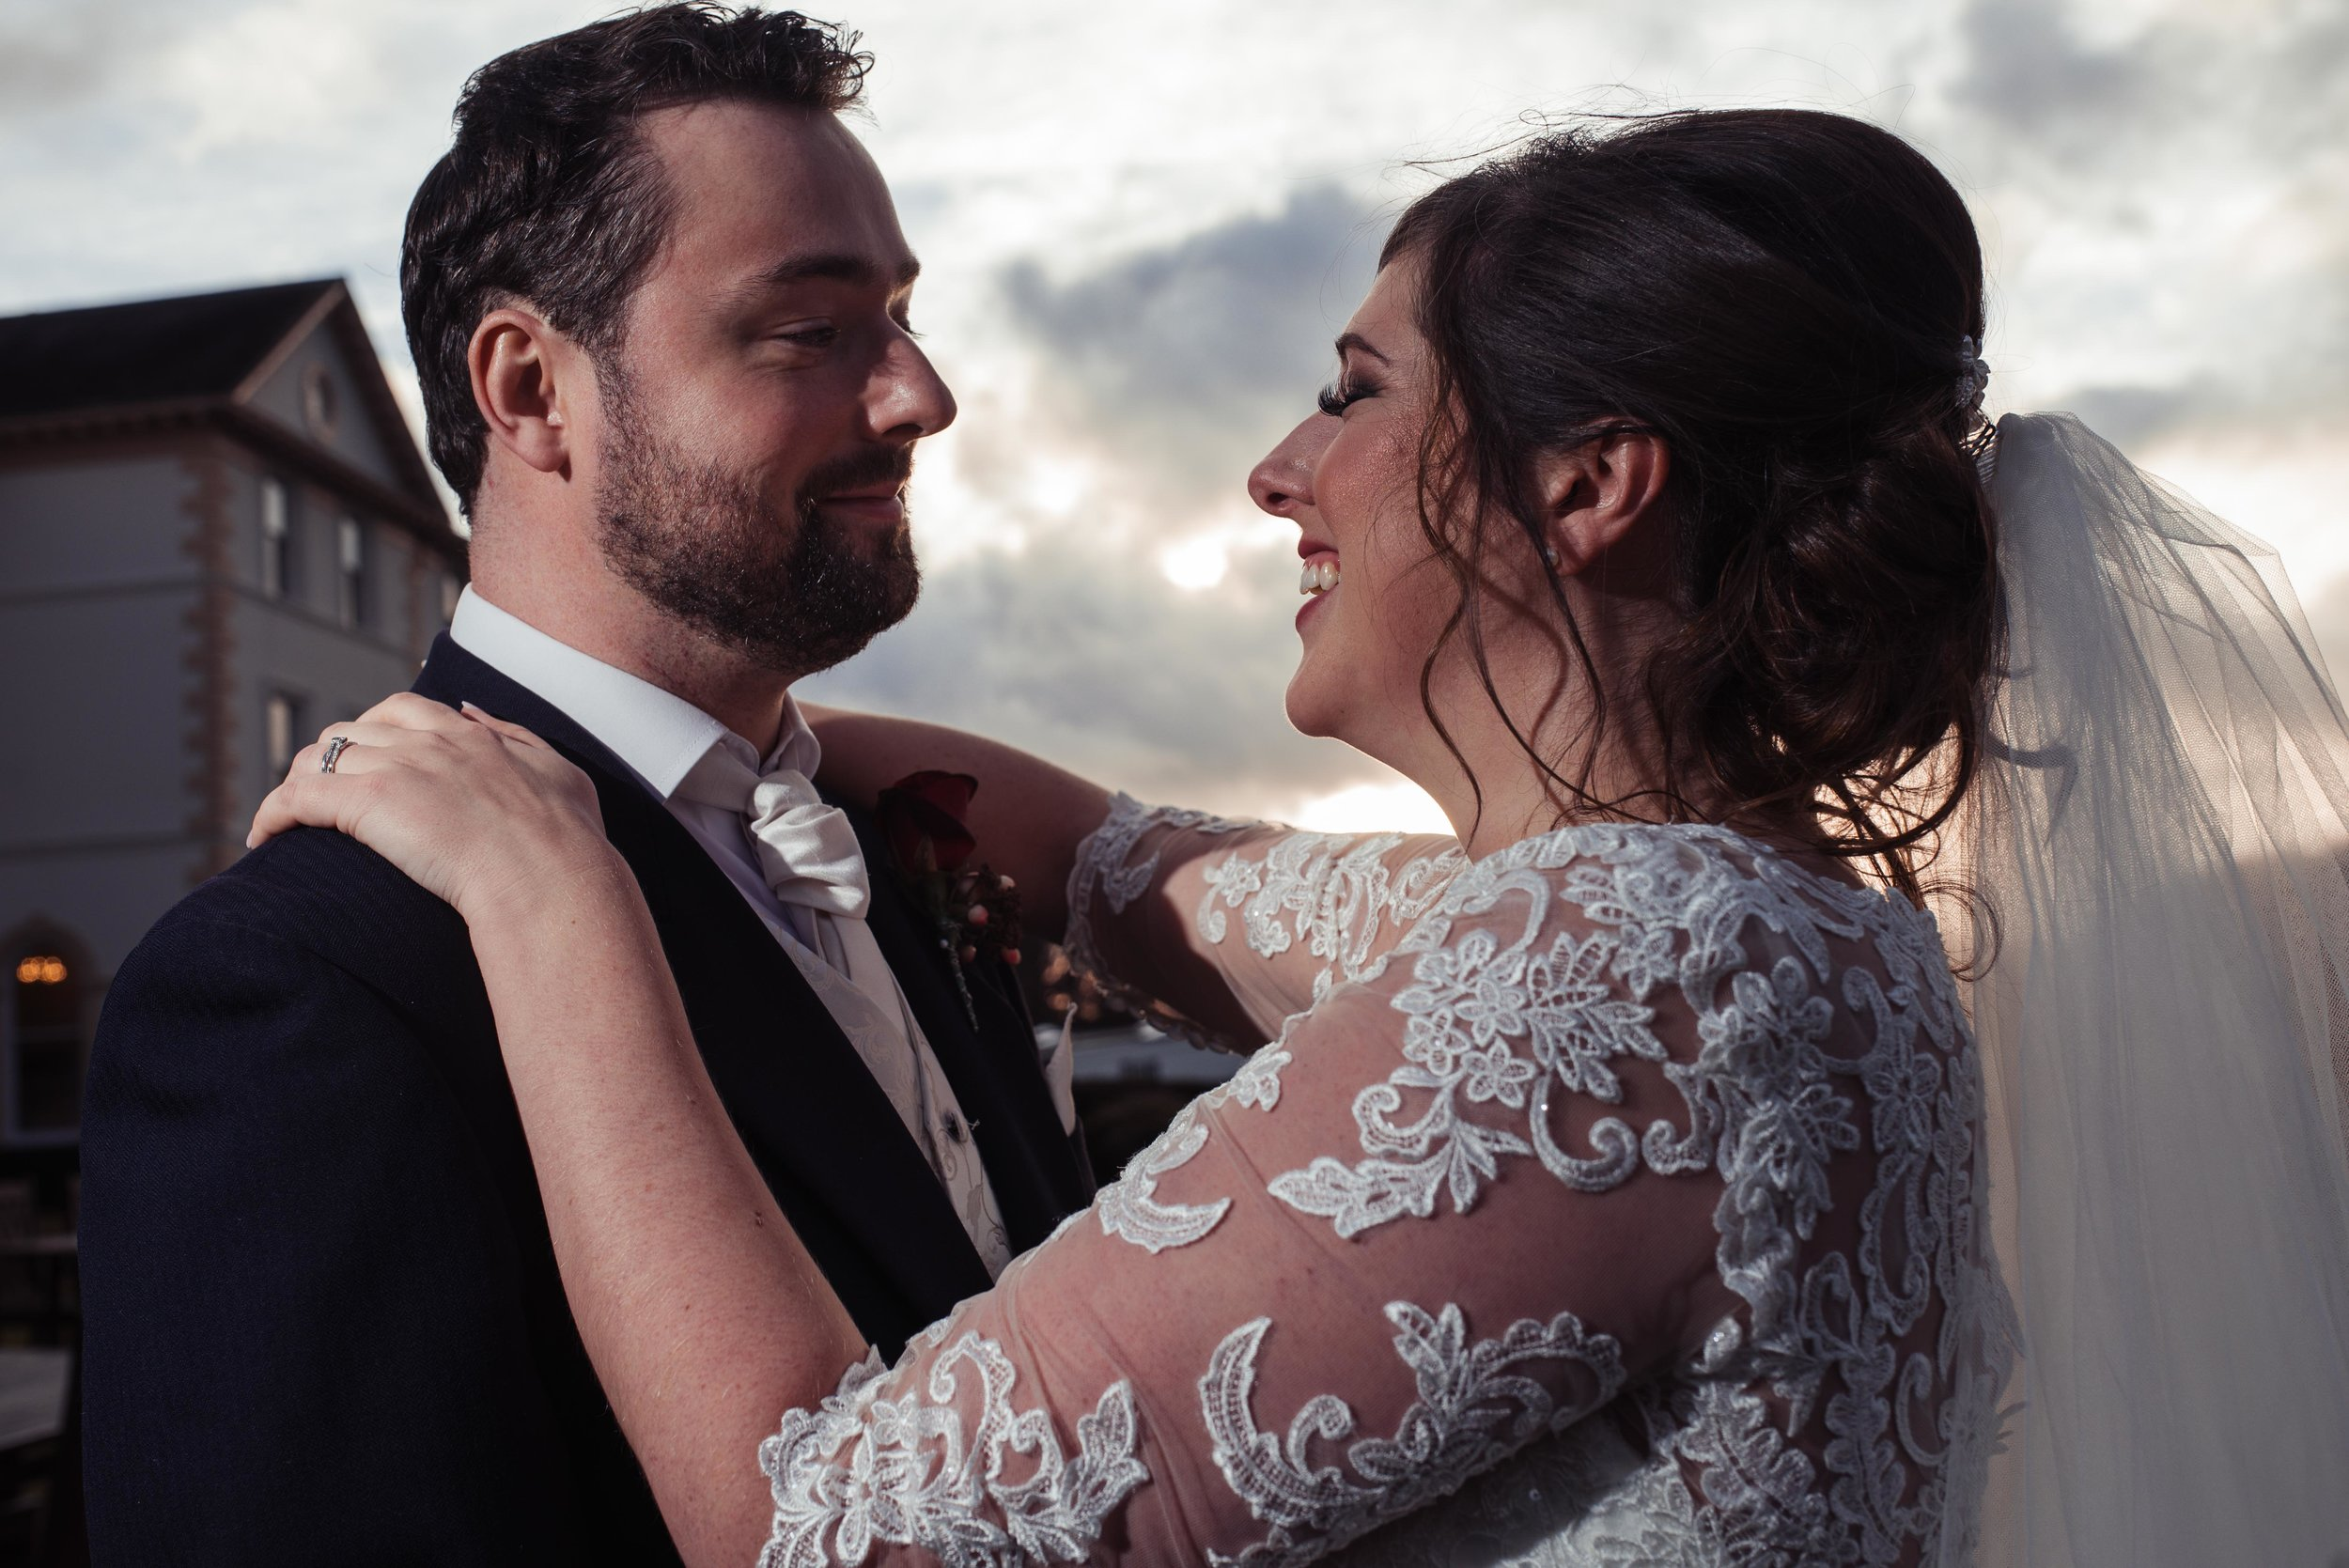 Belsfield-wedding-photography-26.jpg